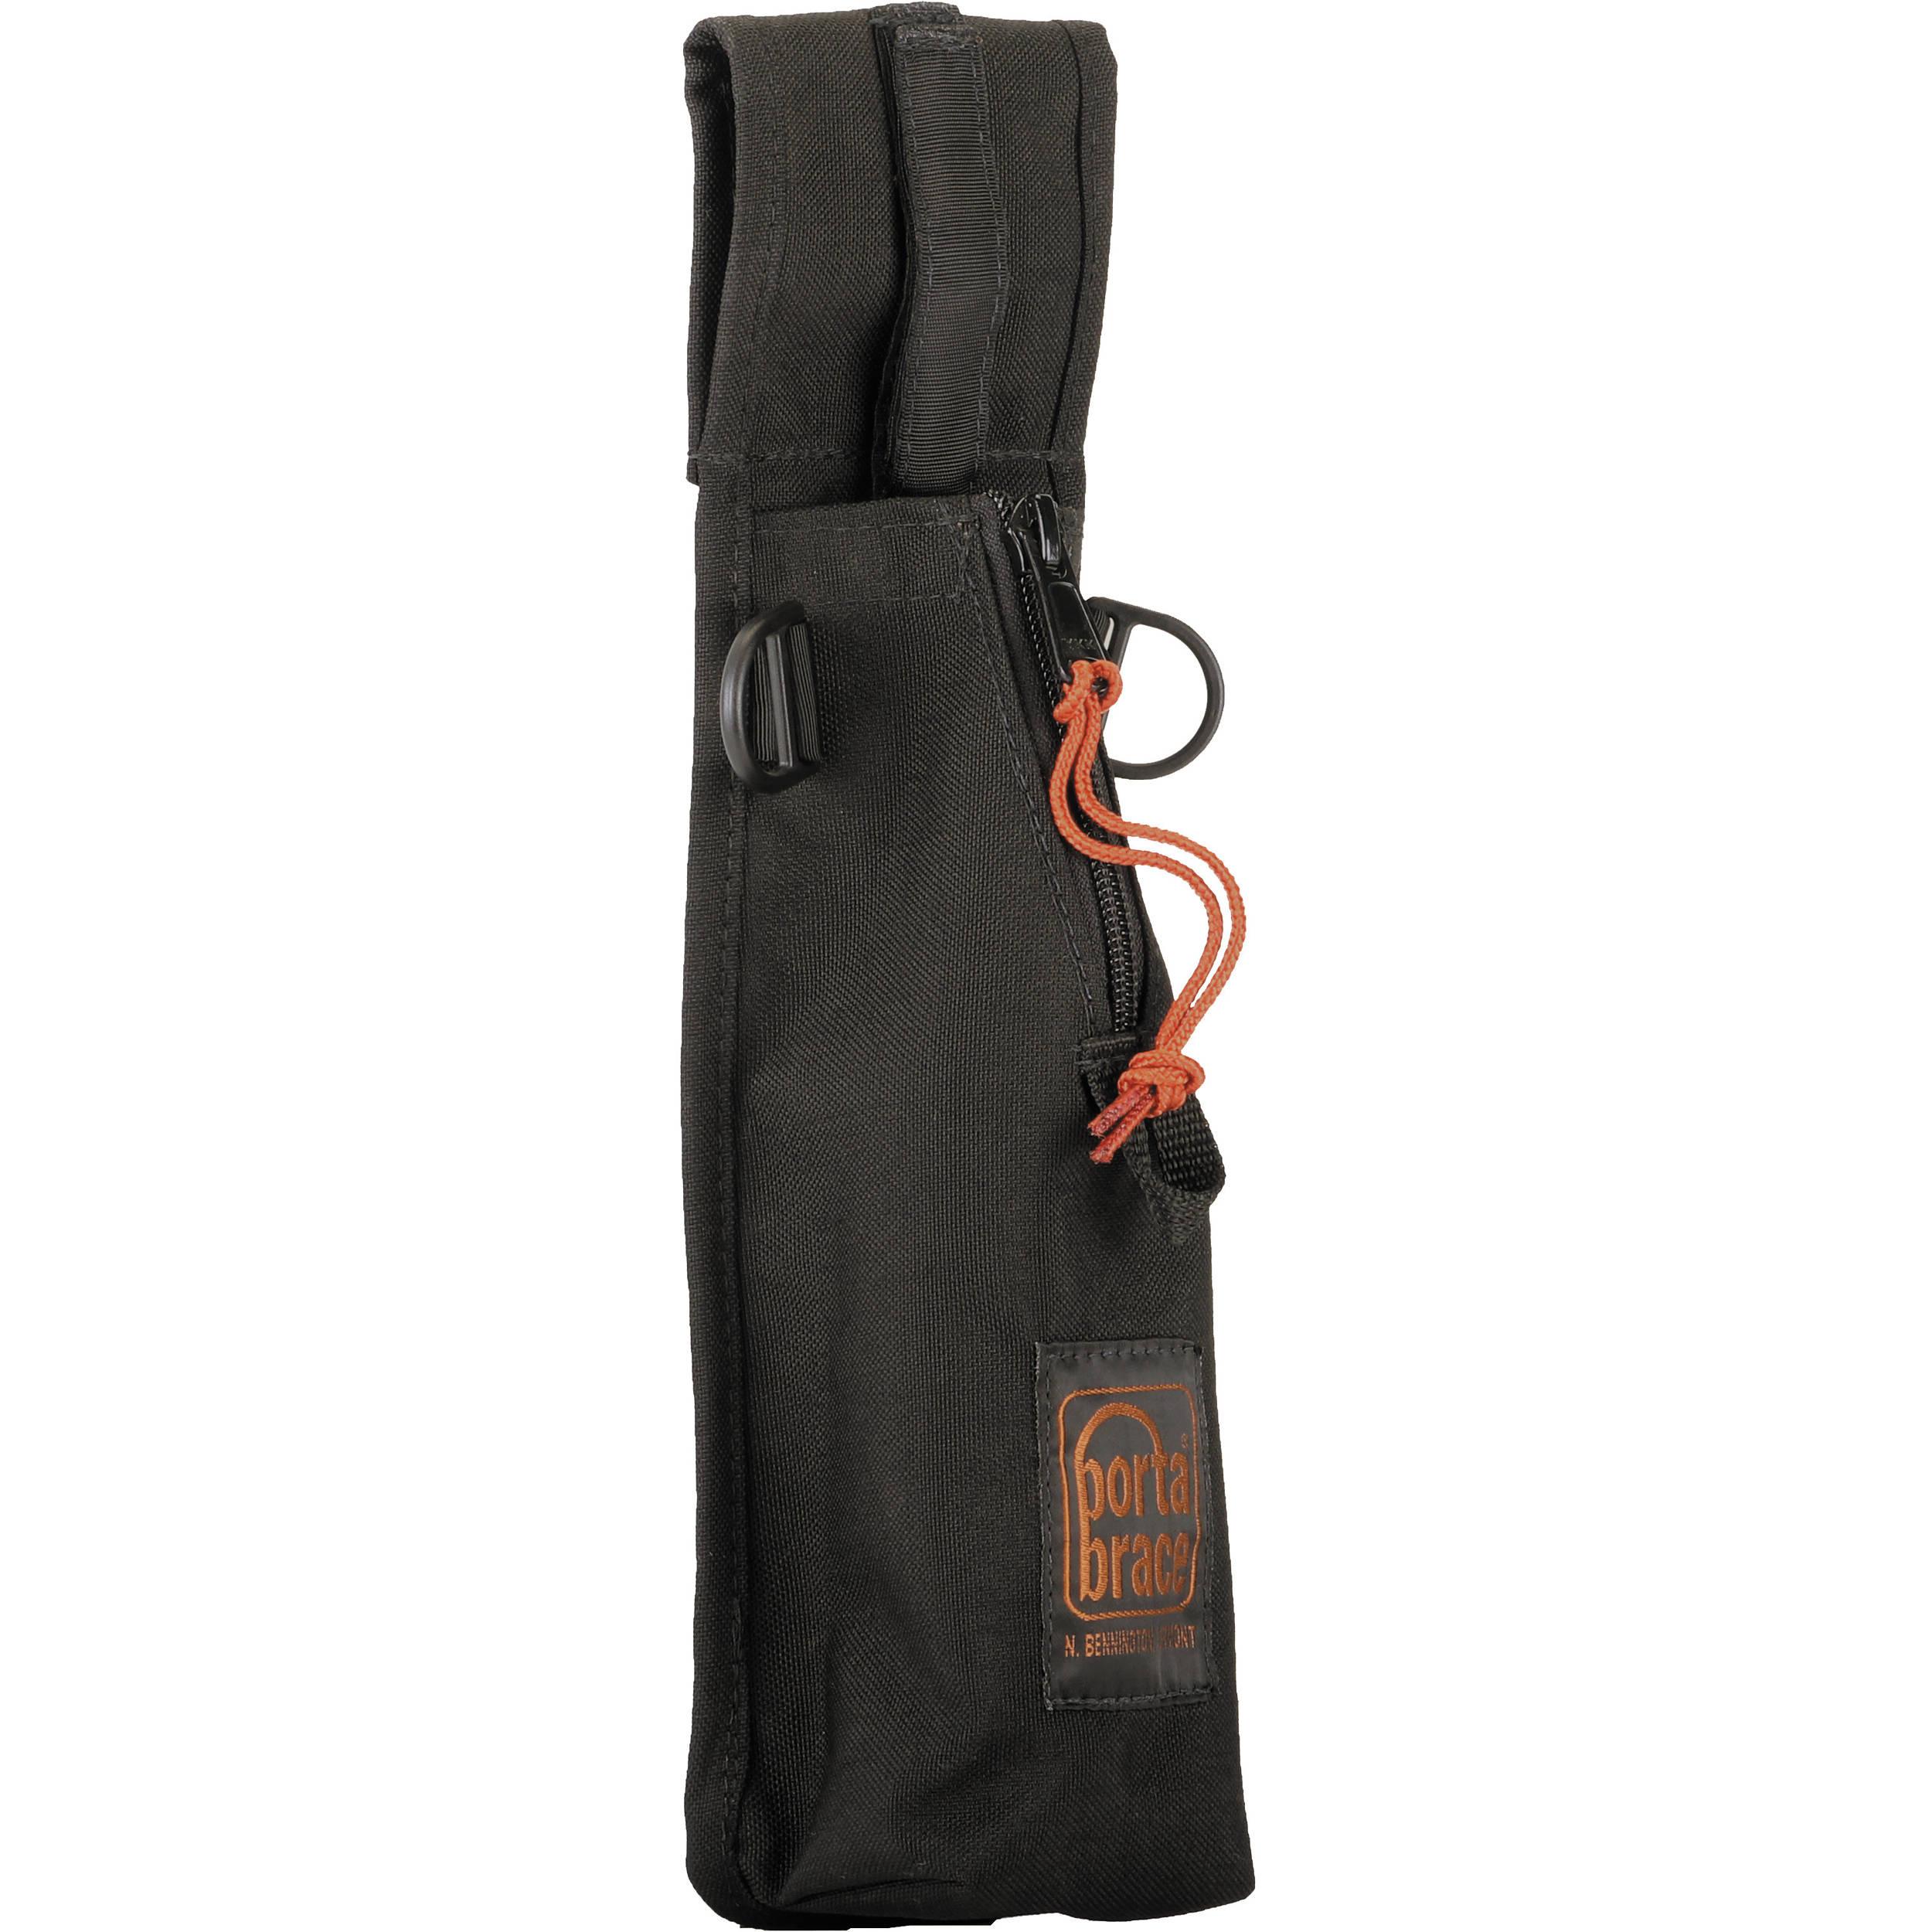 "Porta Brace 10"" Microphone Holster"